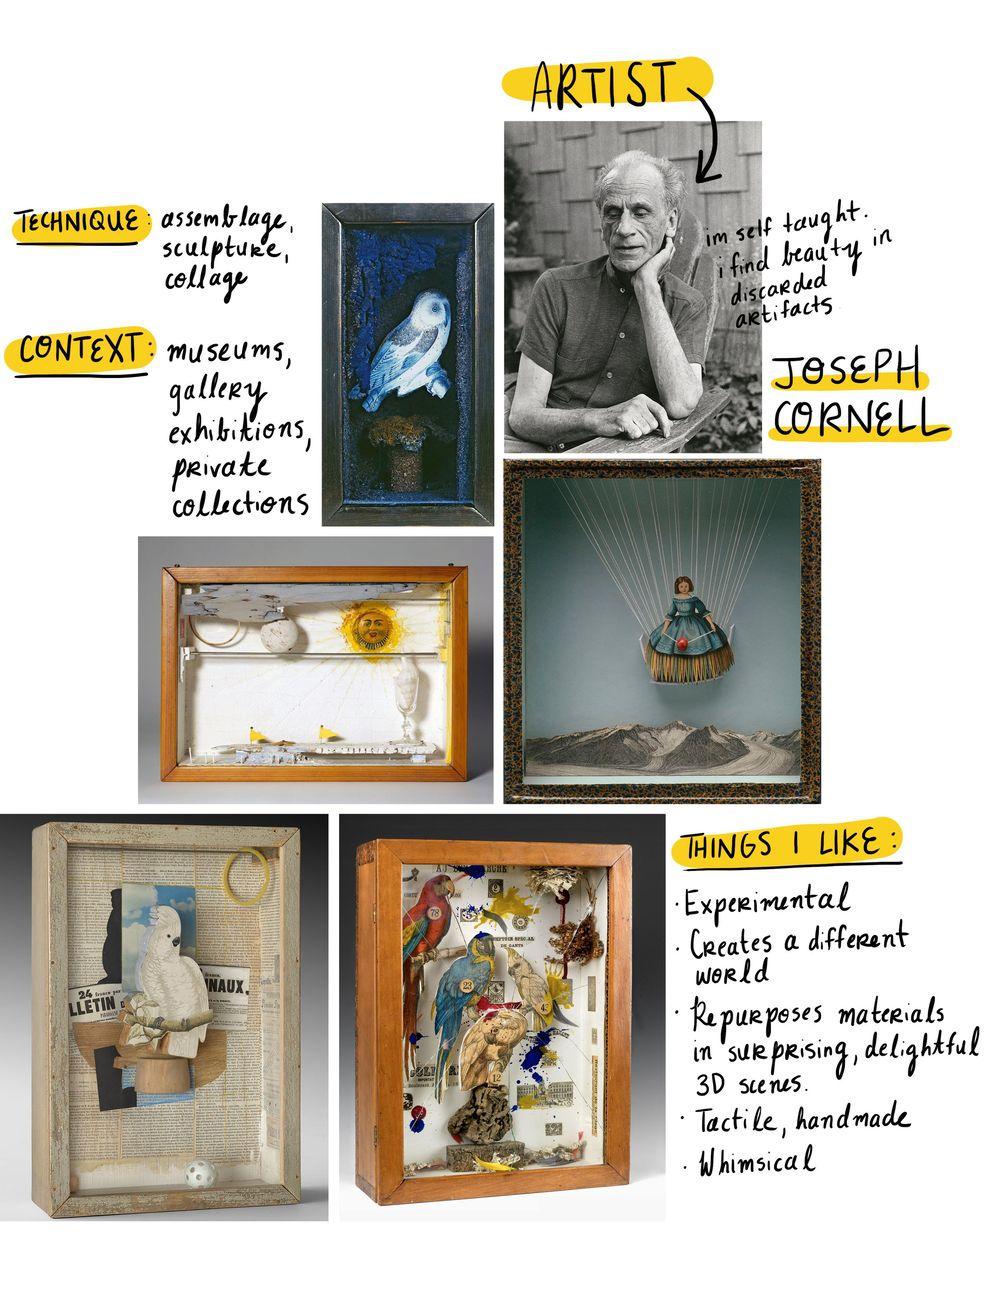 Pilot Illustrations - image 9 - student project